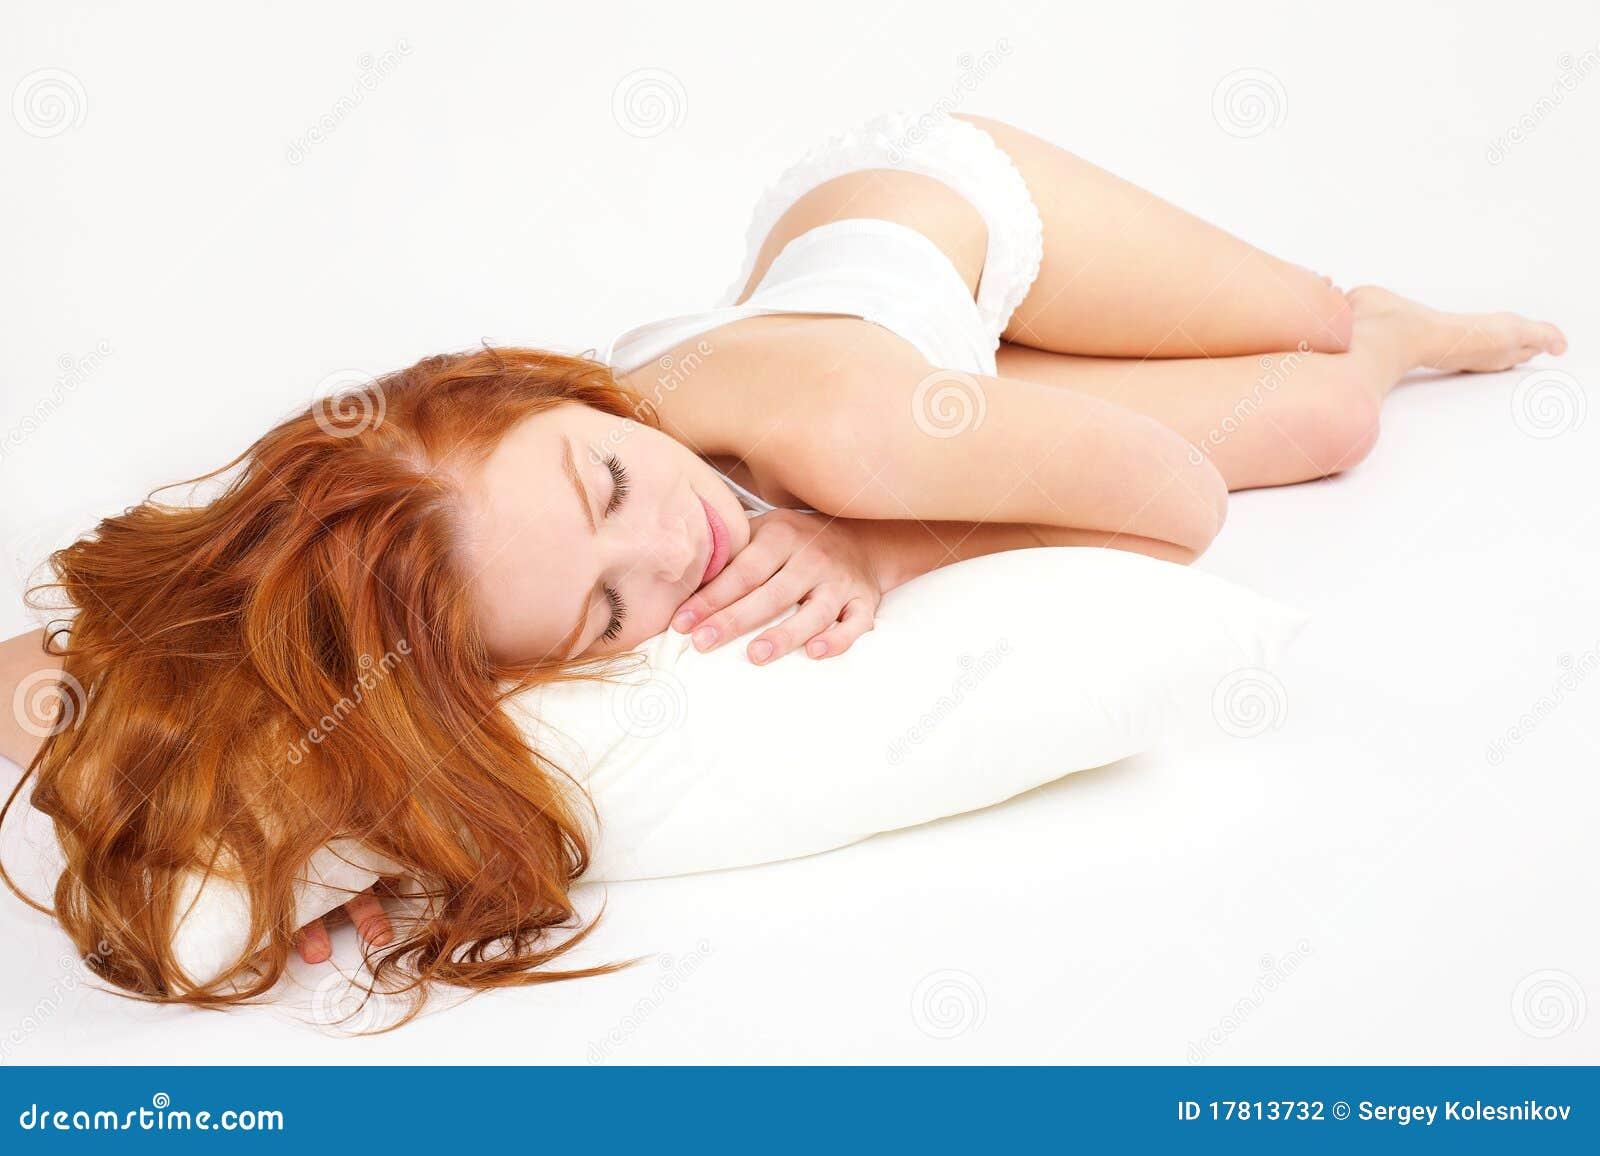 Doesn't matter! sleeping redhead pics were